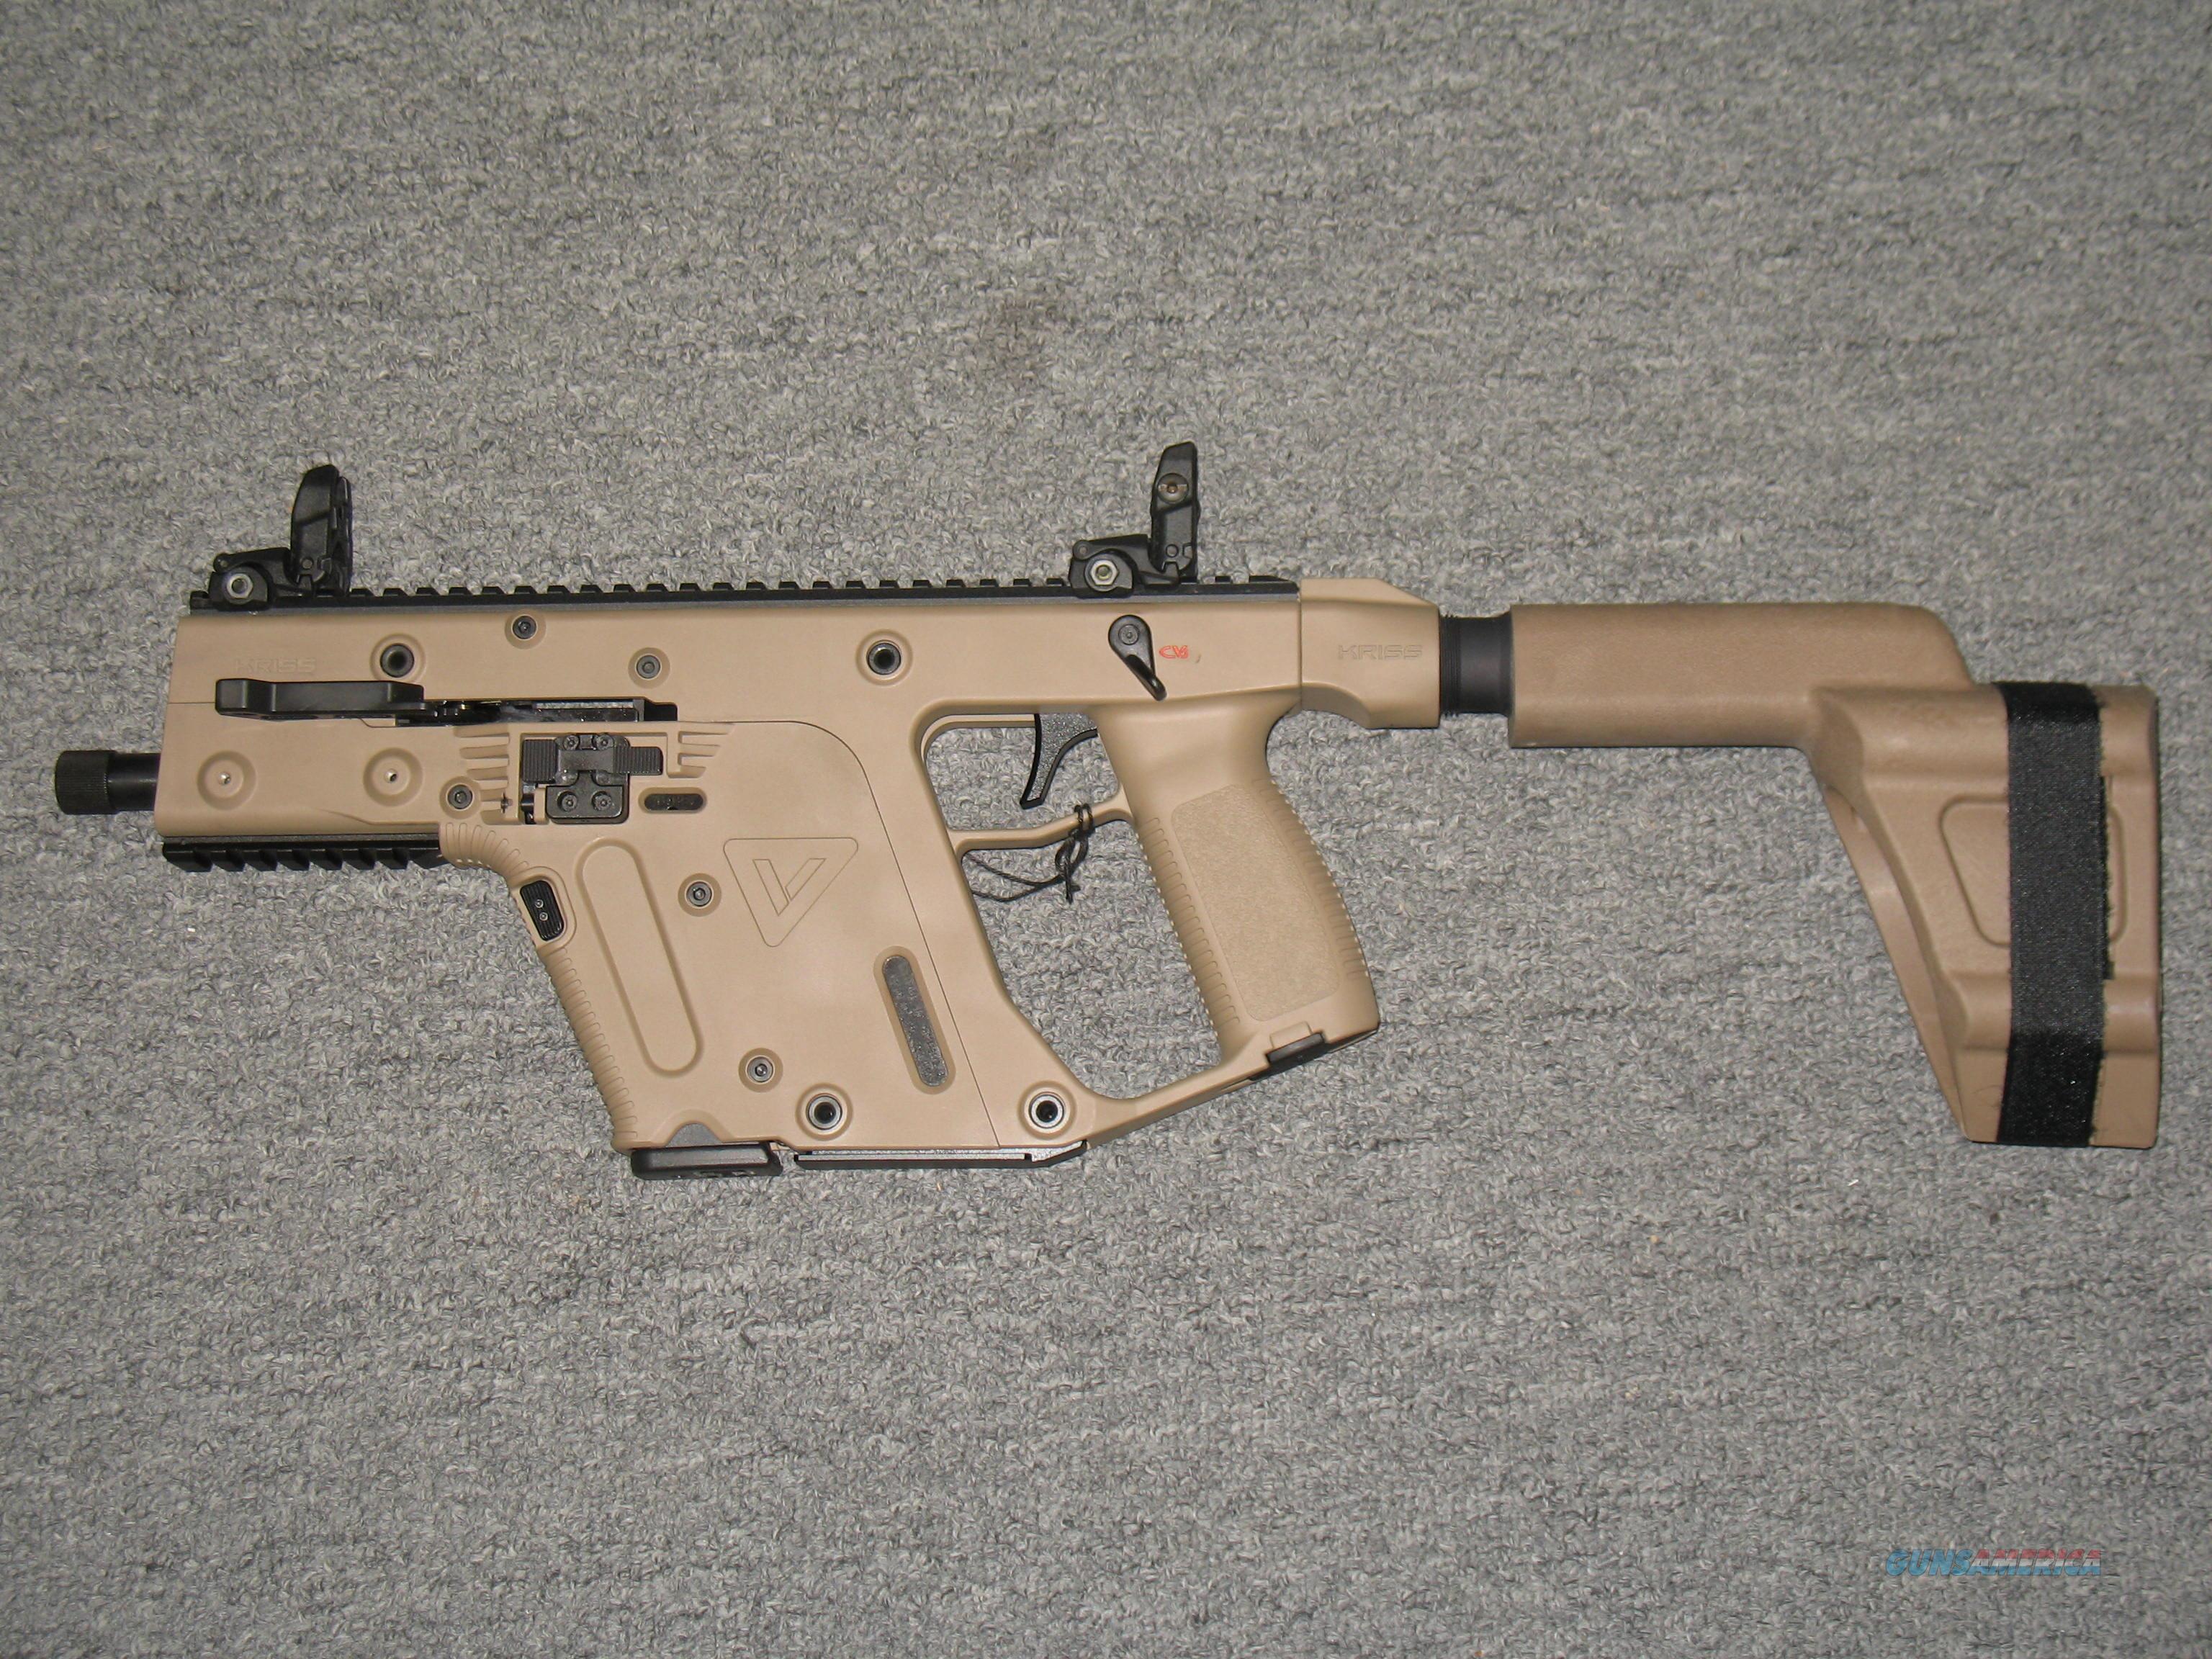 svg transparent library Vector 10mm gun price. Kriss sdp g mm